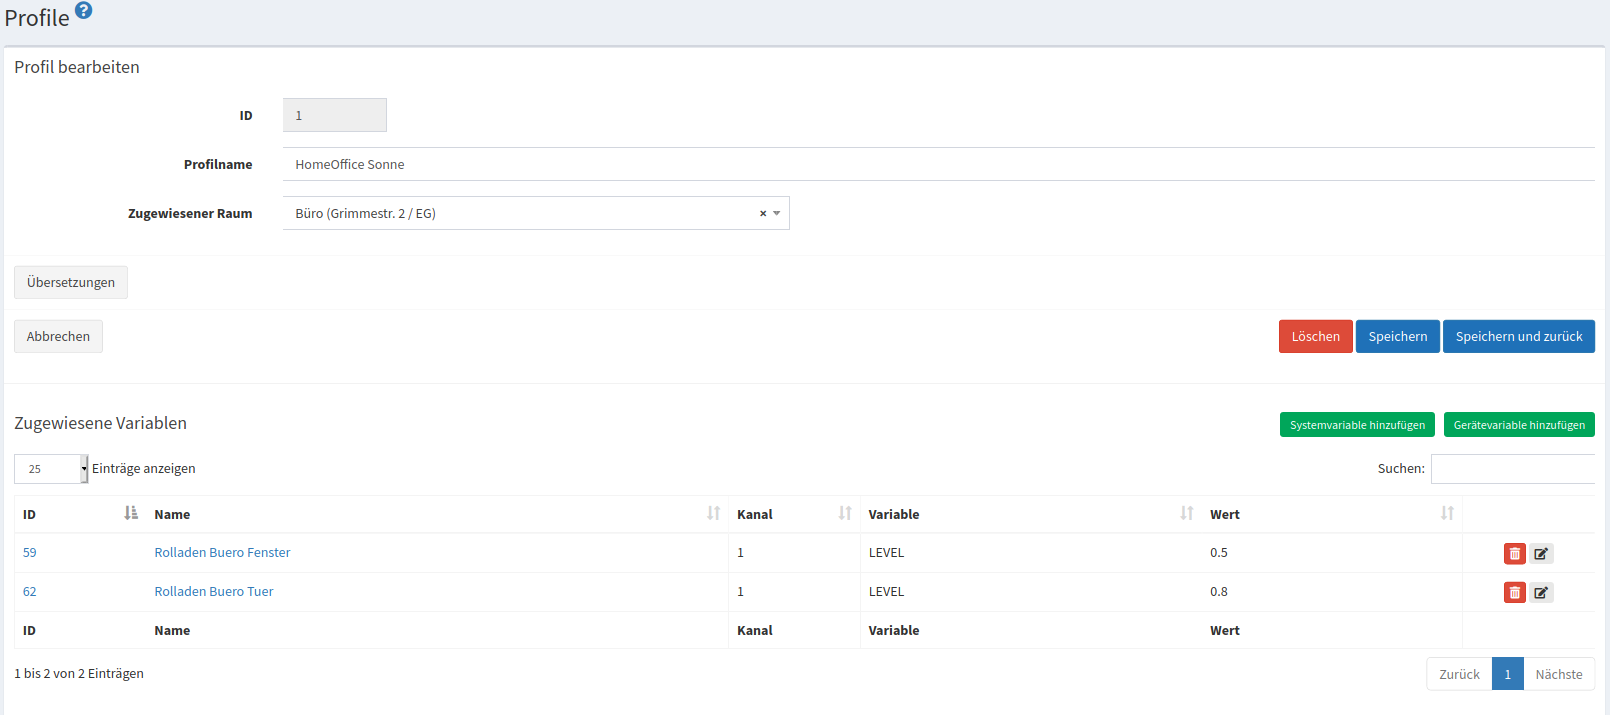 FireShot Capture 104 - smartha Admin - Profile - 192.168.111.240